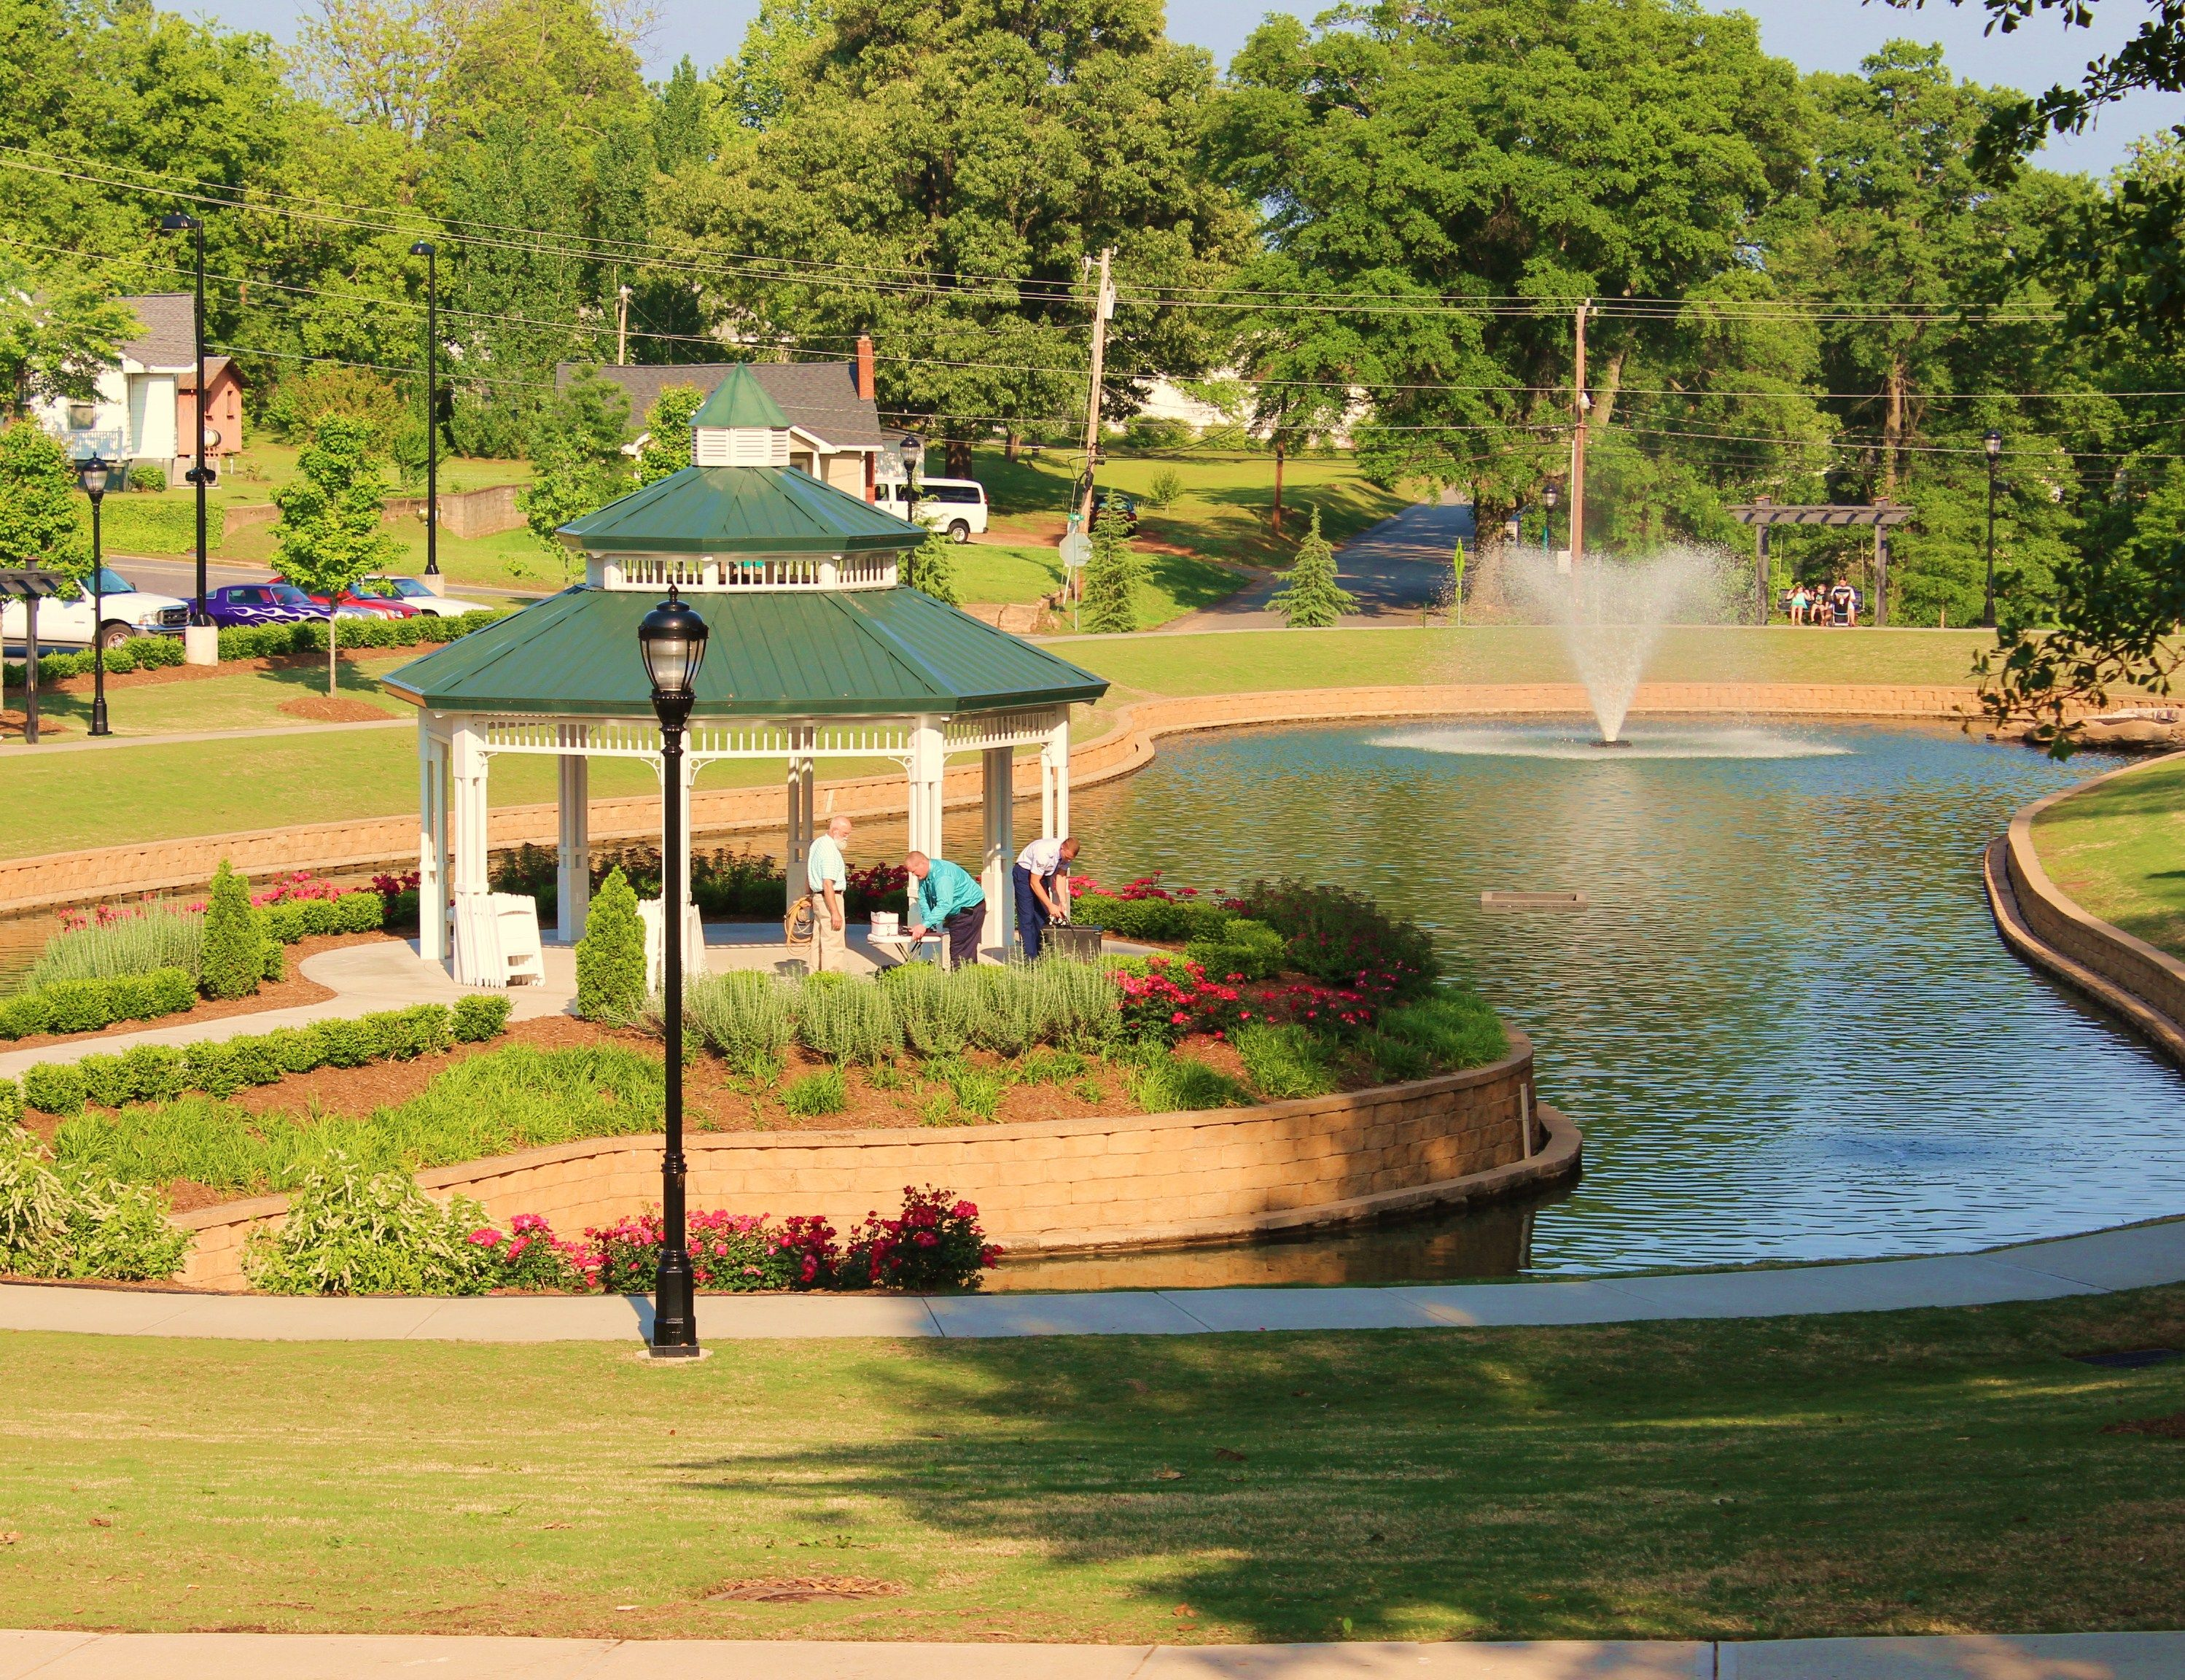 Pin by Robin Giddley on Greer, SC | Park weddings, Park ...